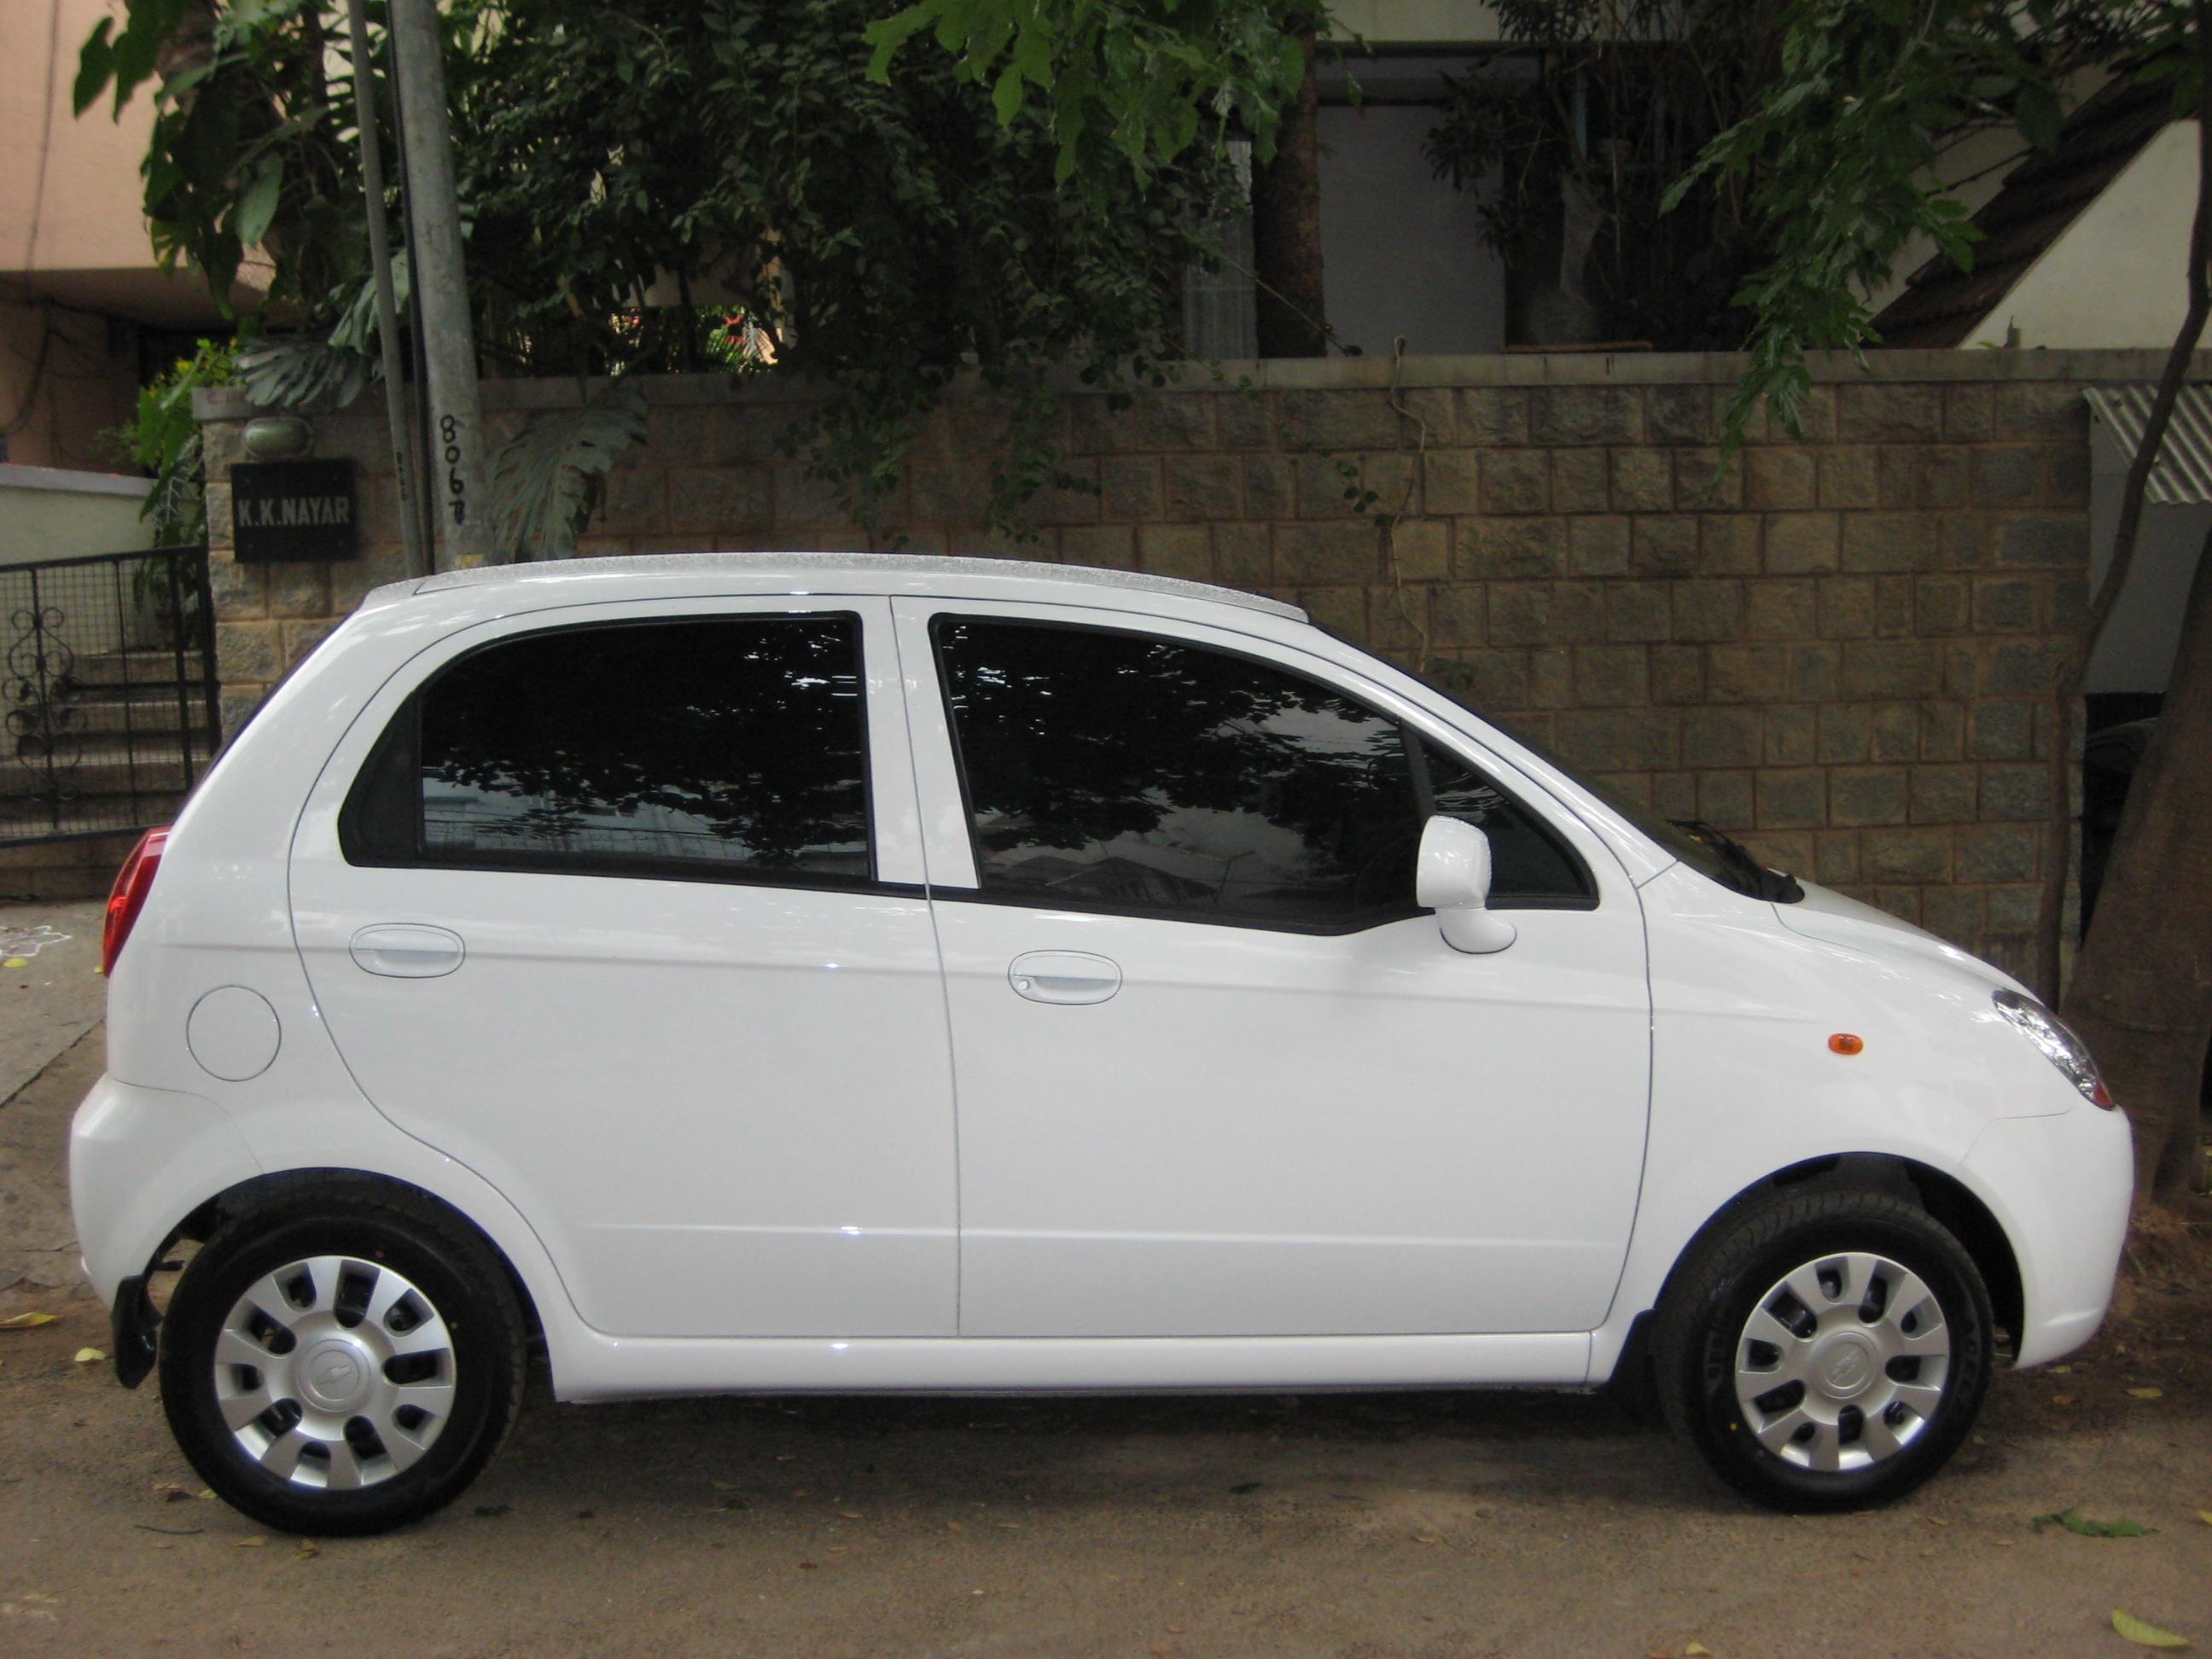 Car colour white - My New Spark Ls White Colour Beige Interior Chevrolet Spark Consumer Review Mouthshut Com